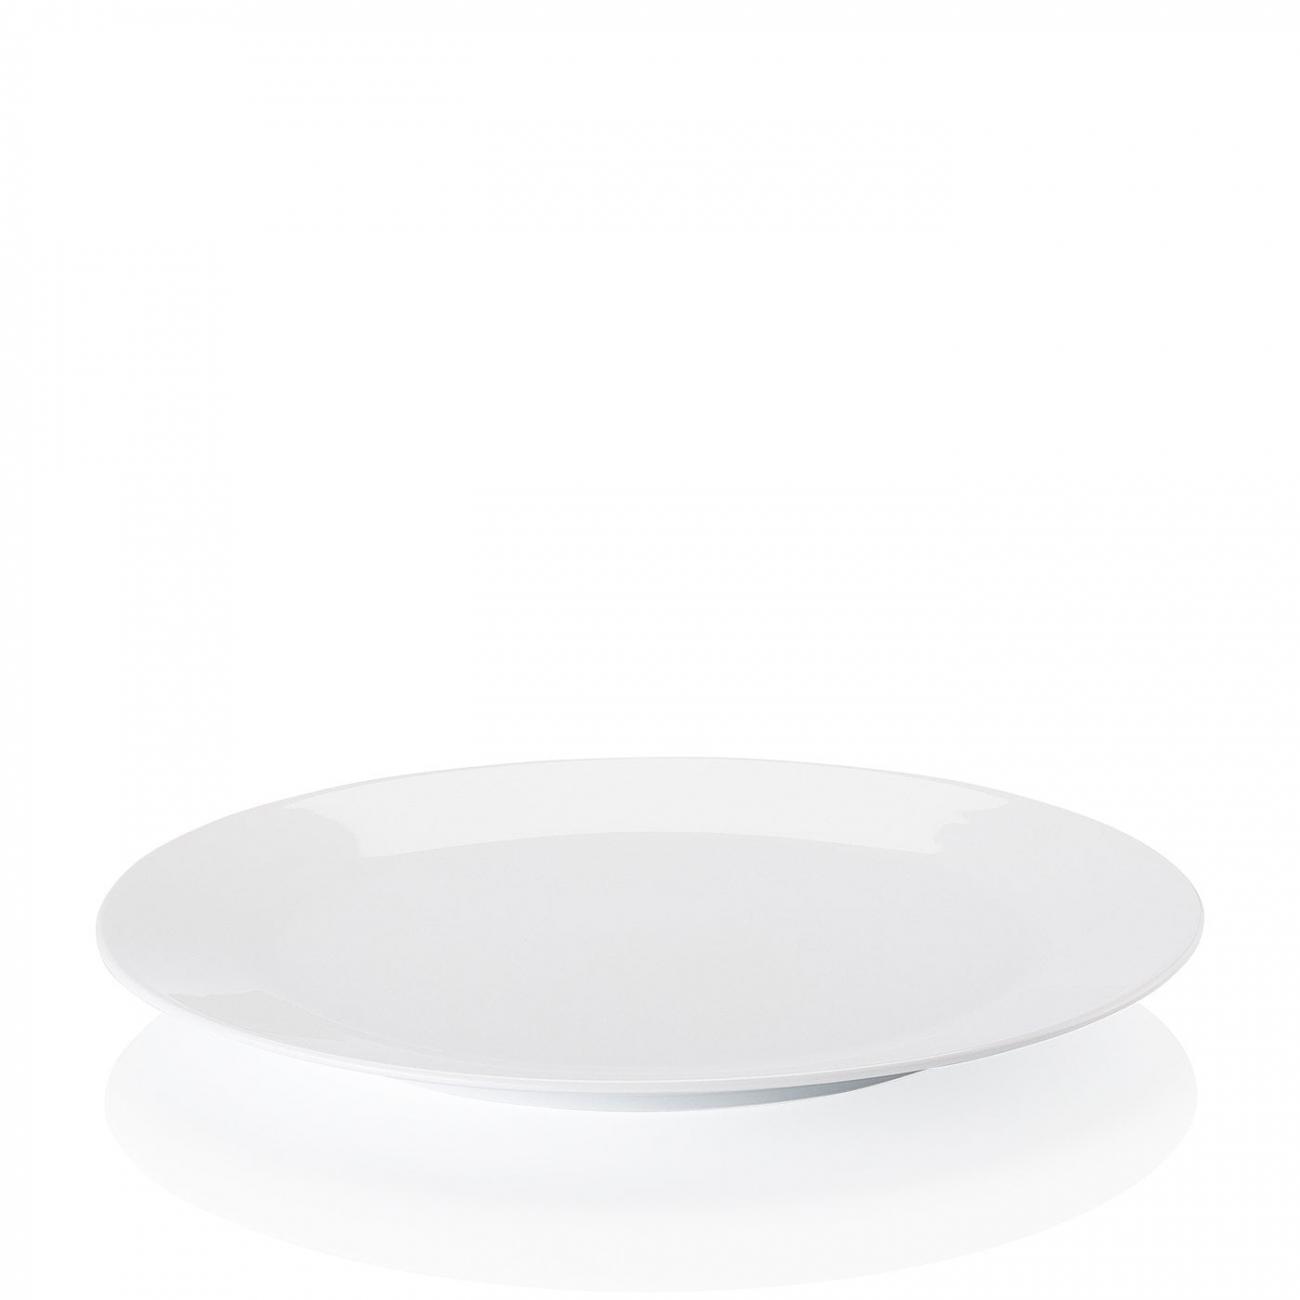 Arzberg Tric Piatto Gourmet